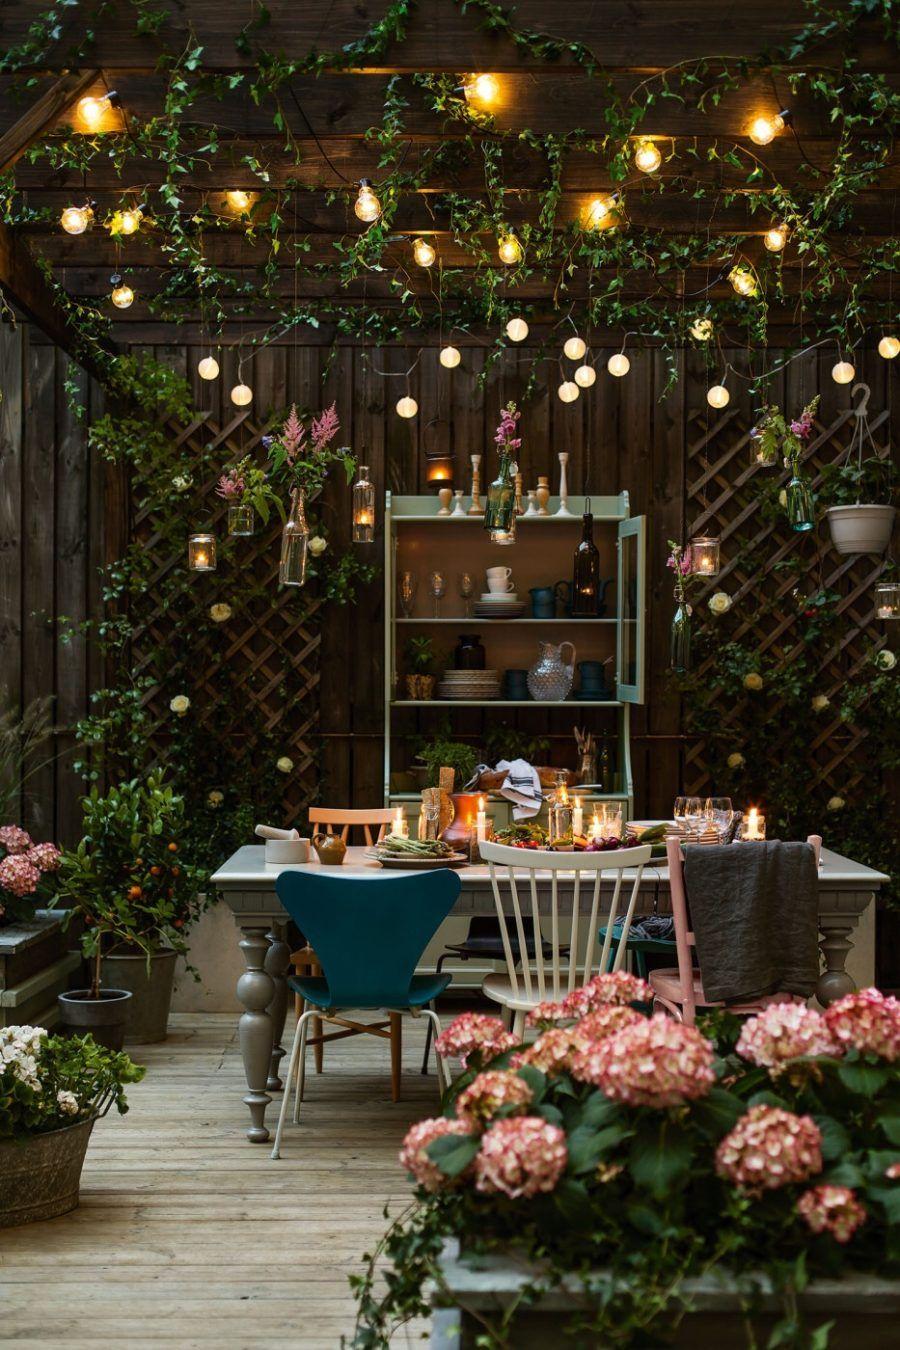 Brilliant backyard ideas big and small backyard lights and gardens